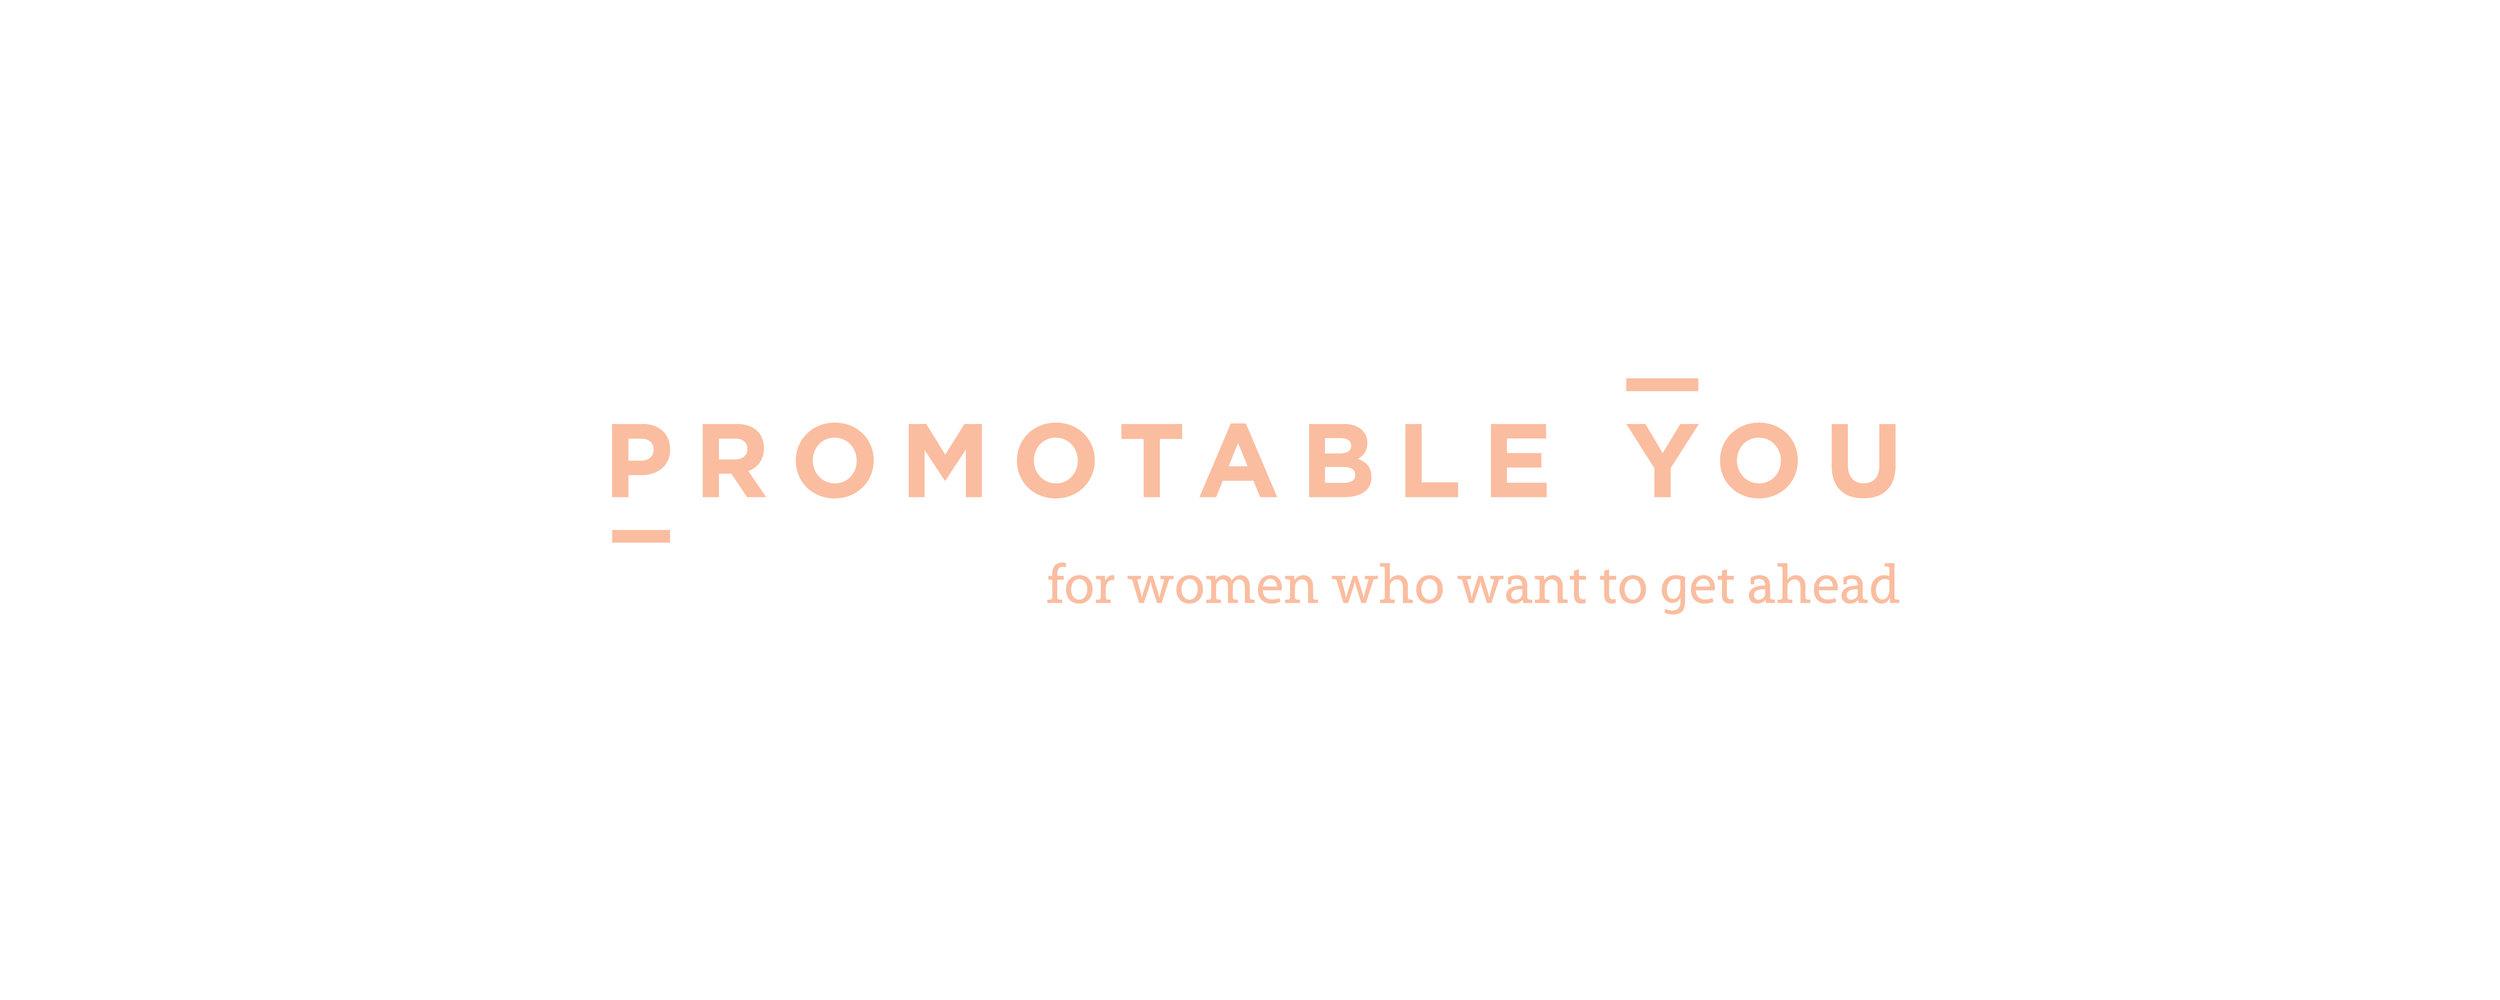 promotable-you-logo.jpg